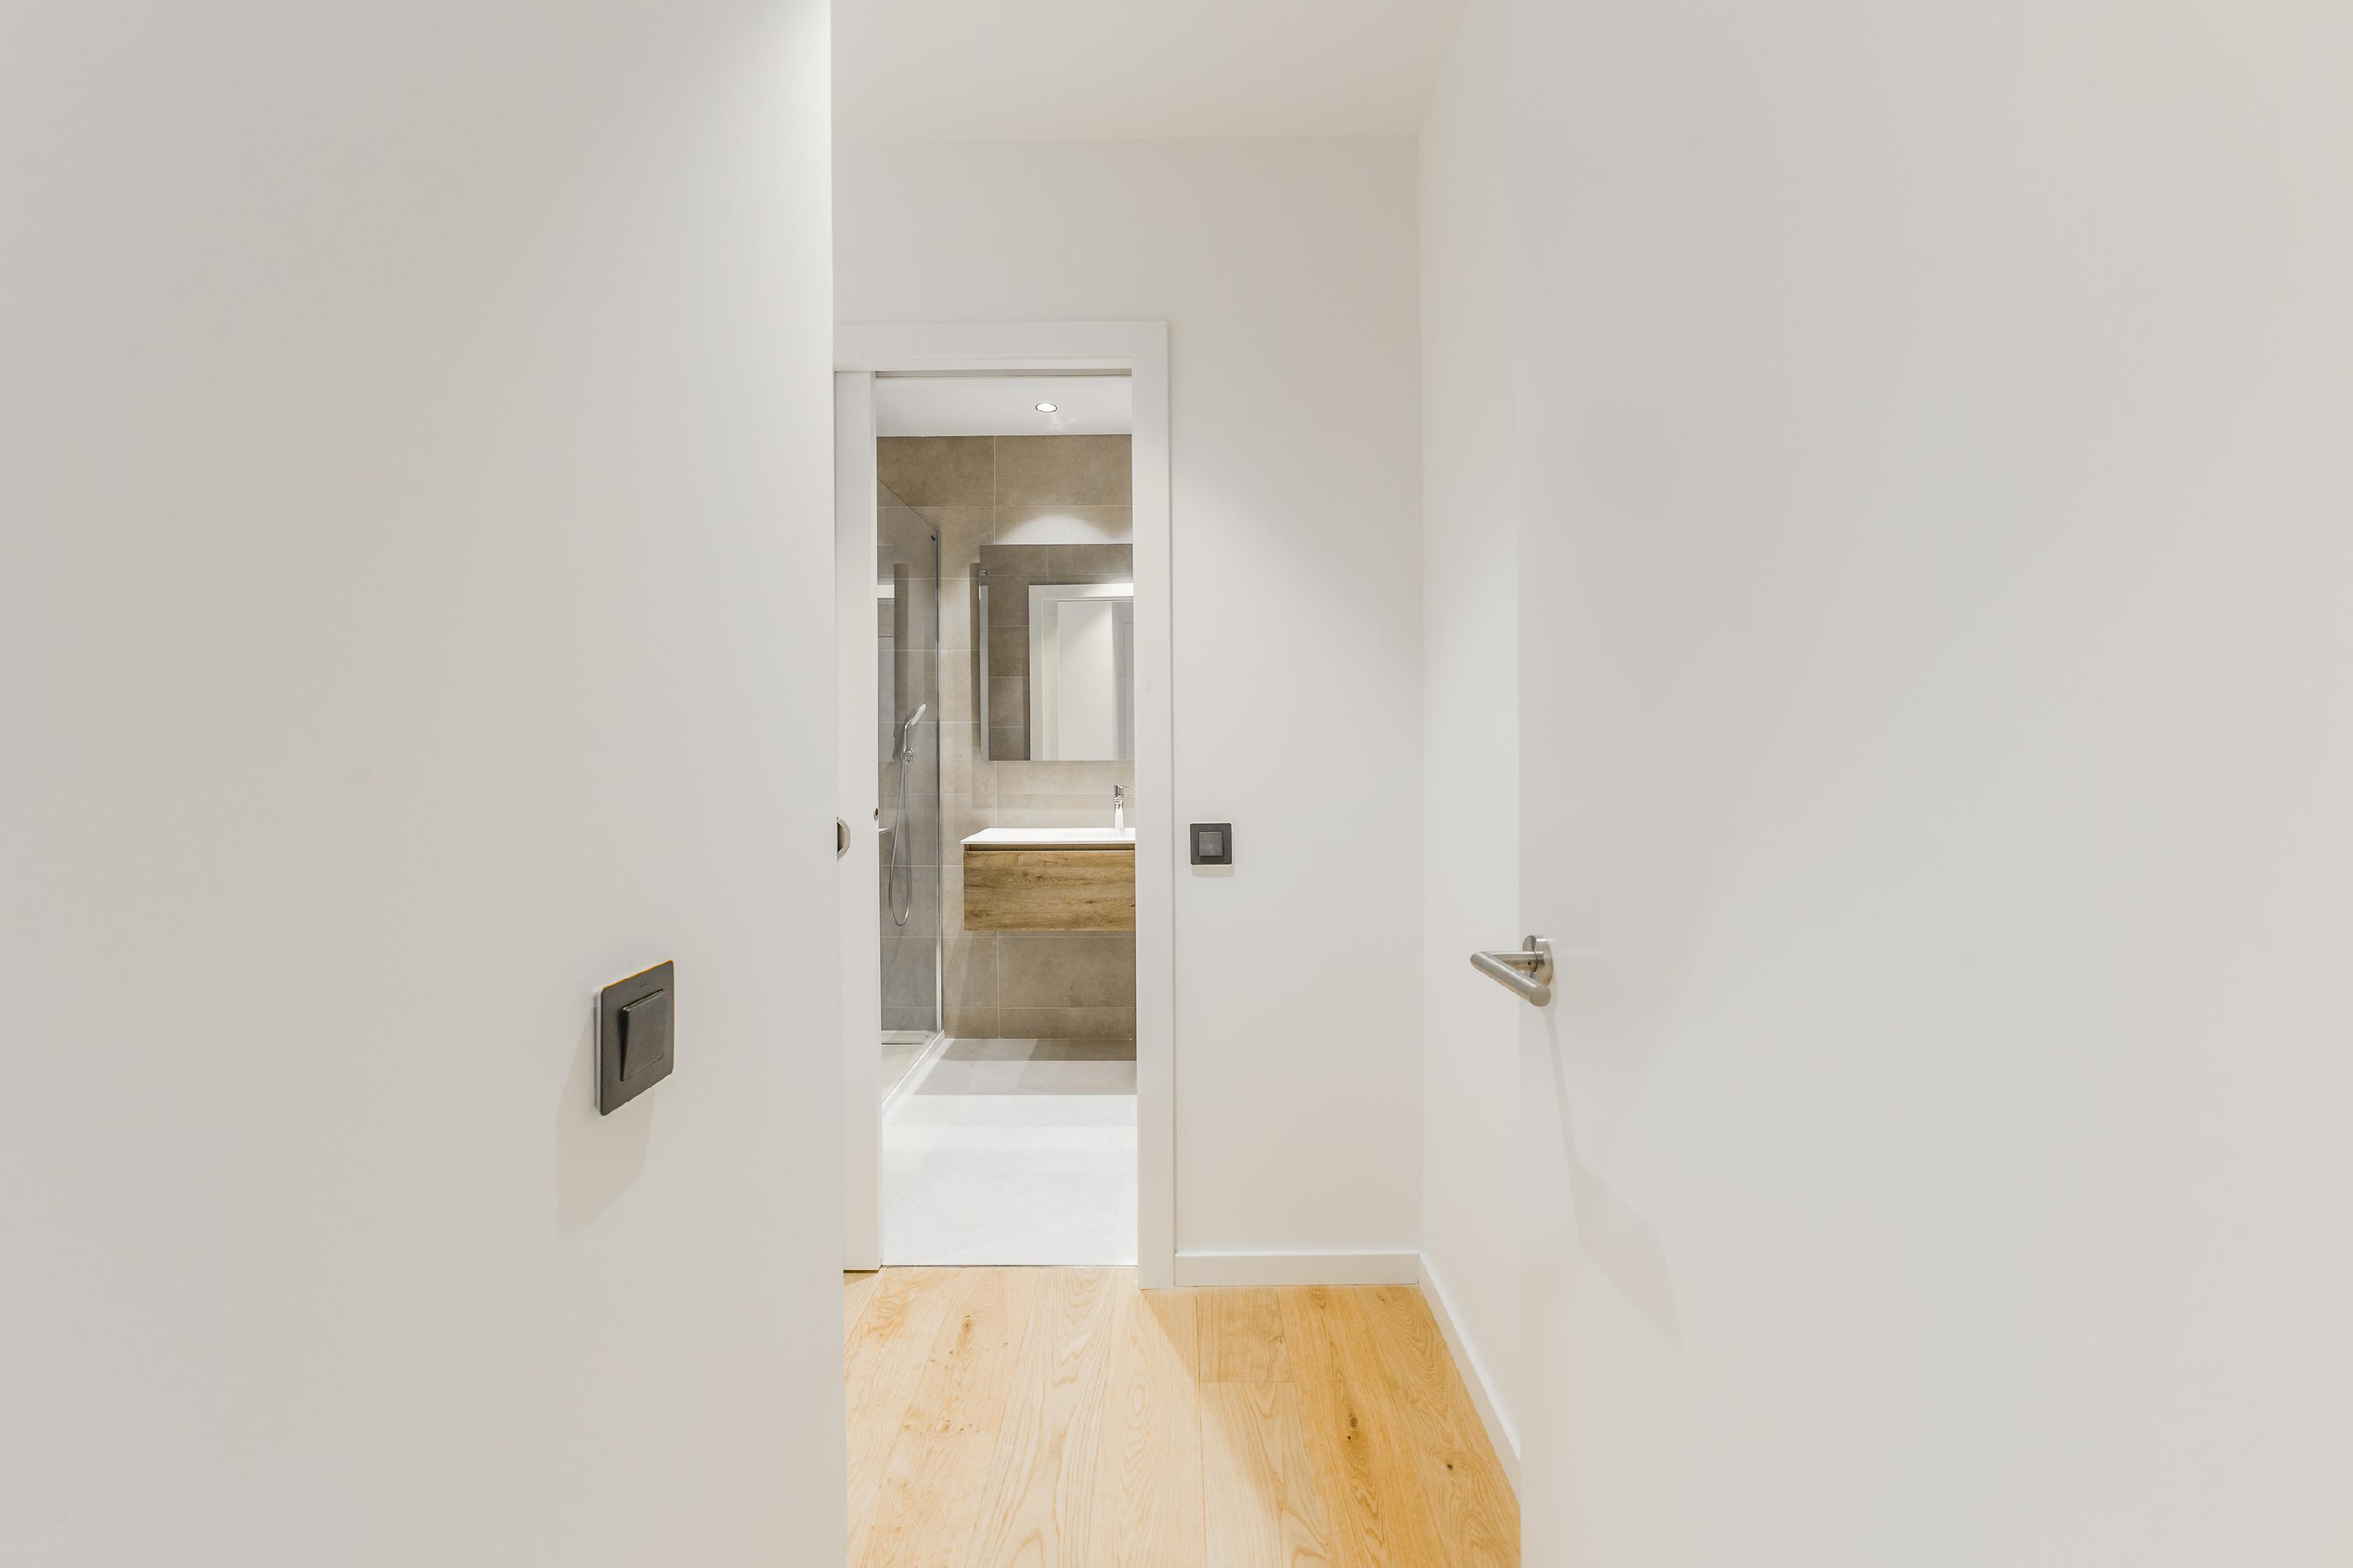 182456 Apartamento en venda en Eixample, Antiga Esquerre Eixample 15